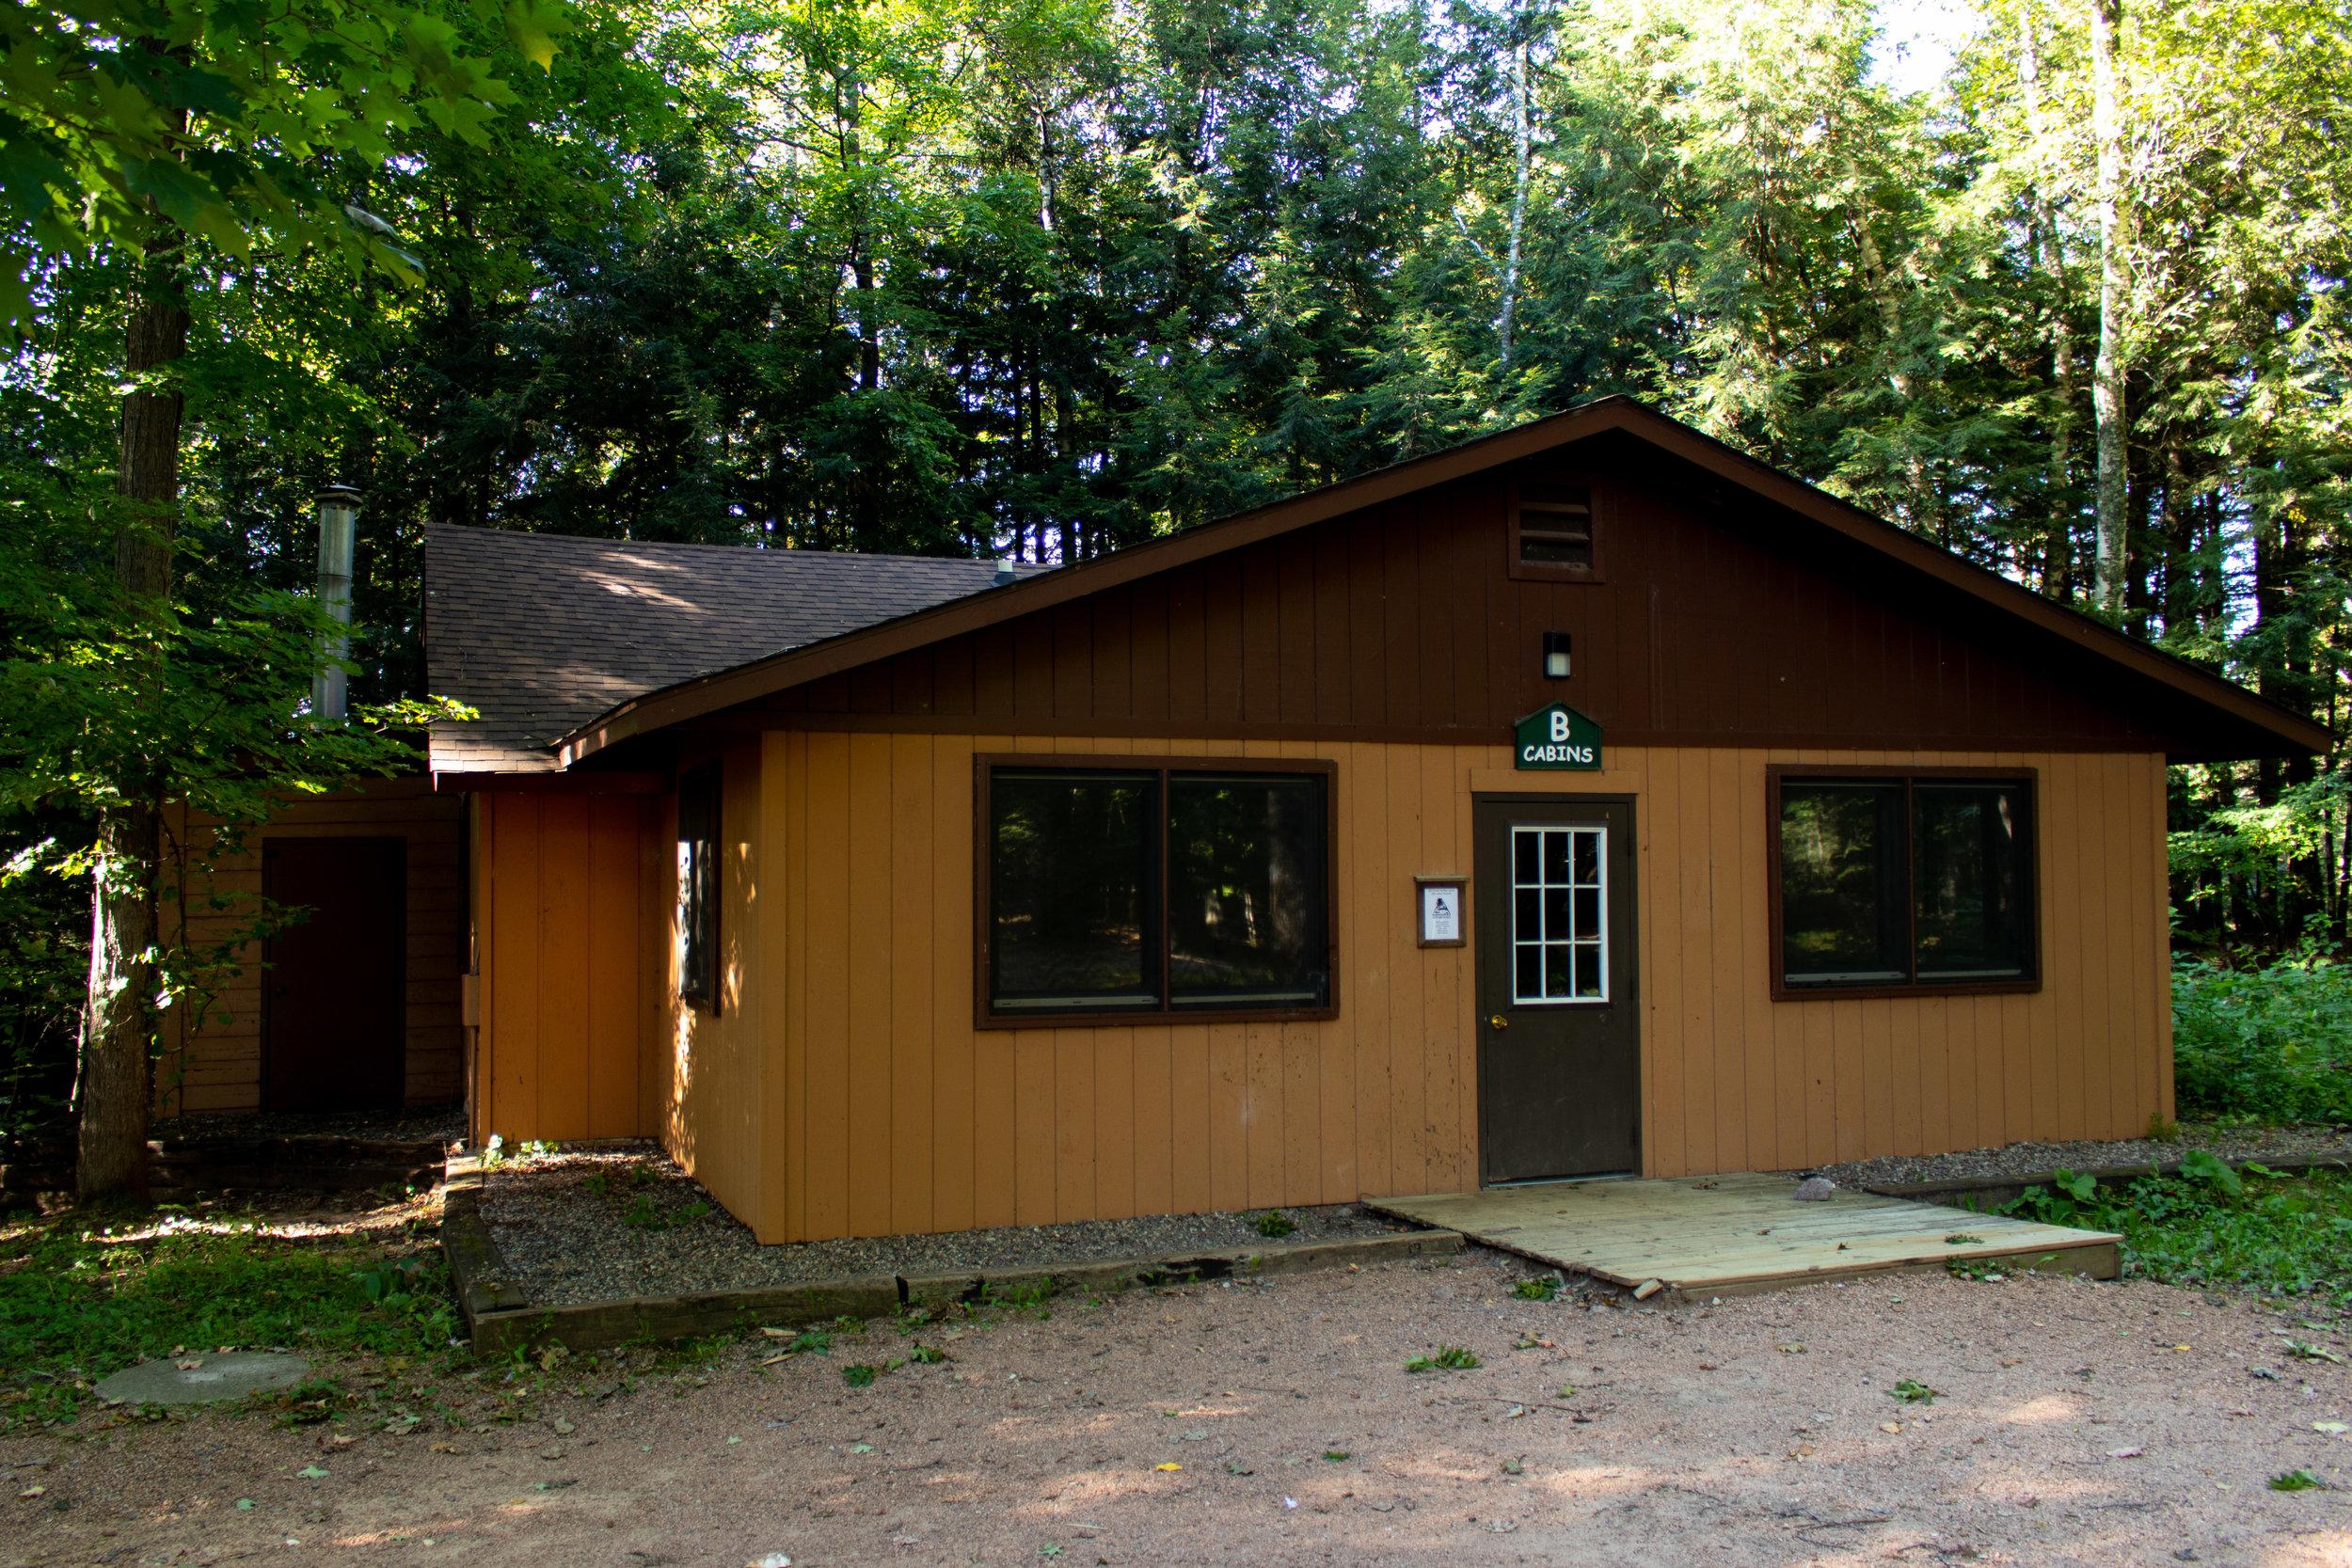 B Cabins